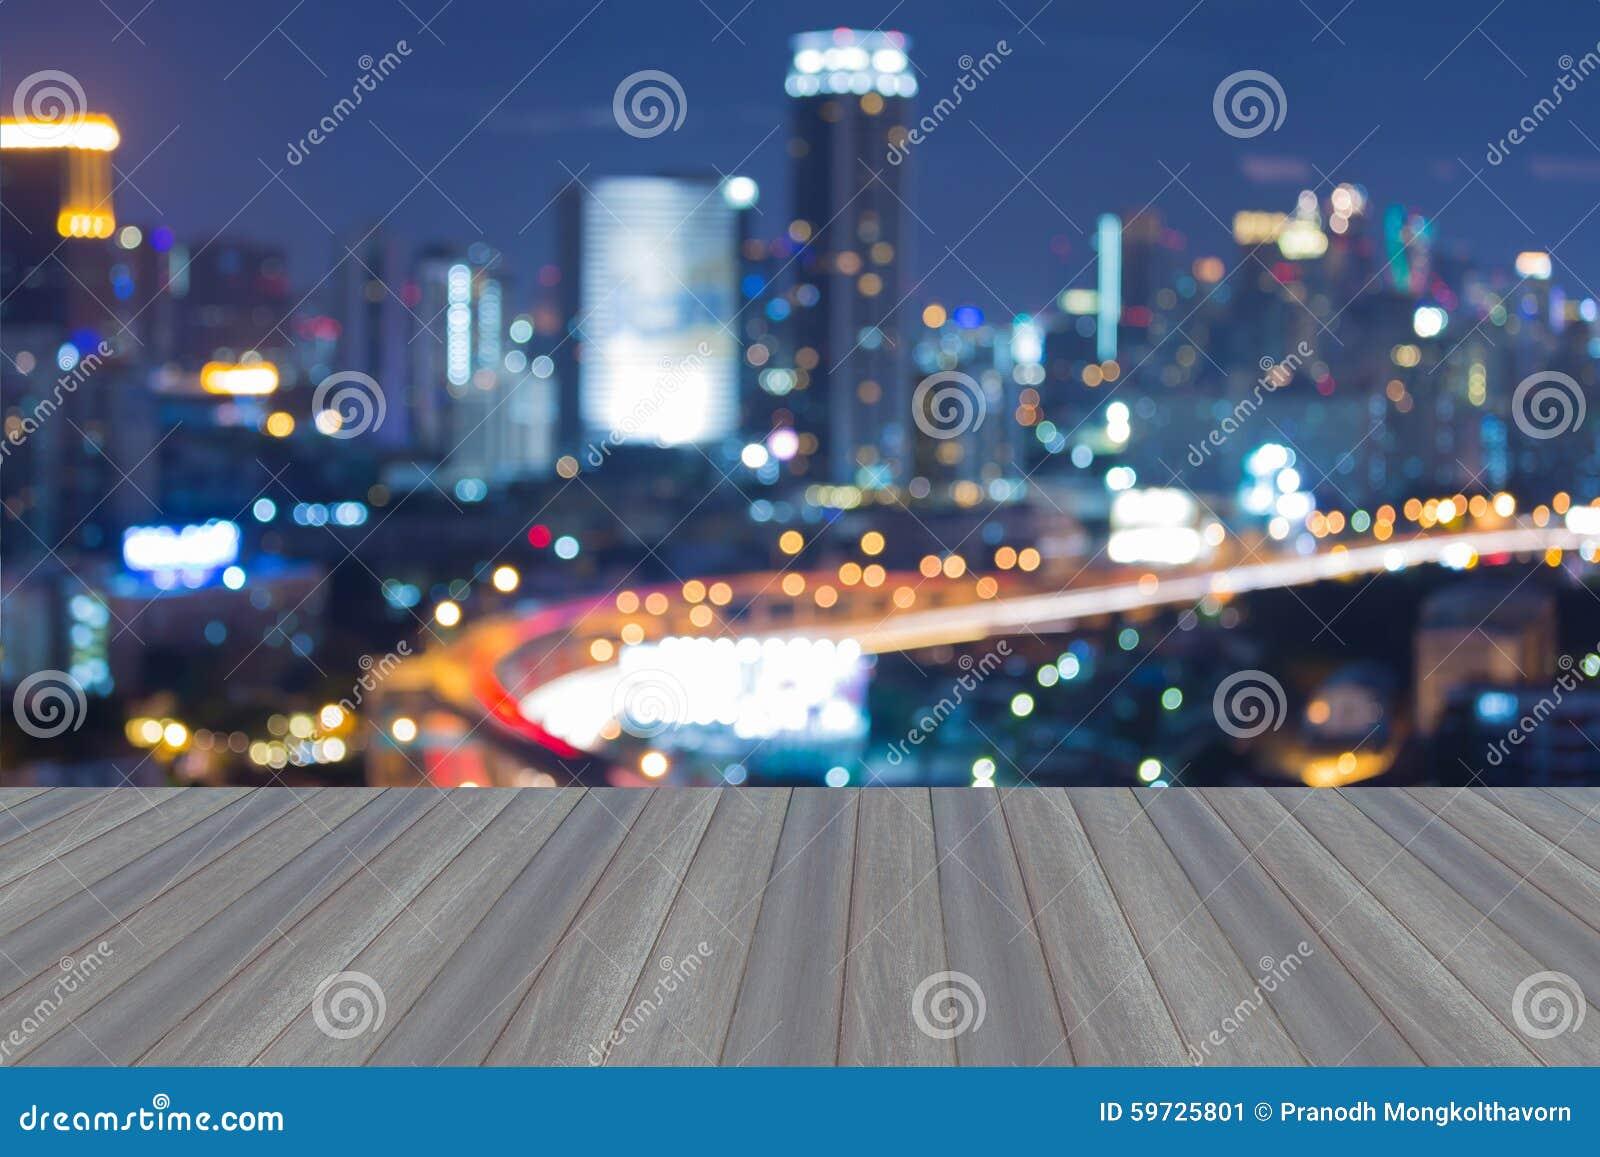 Wooden Floor Roof Top View With Blurred City Bokeh Lights